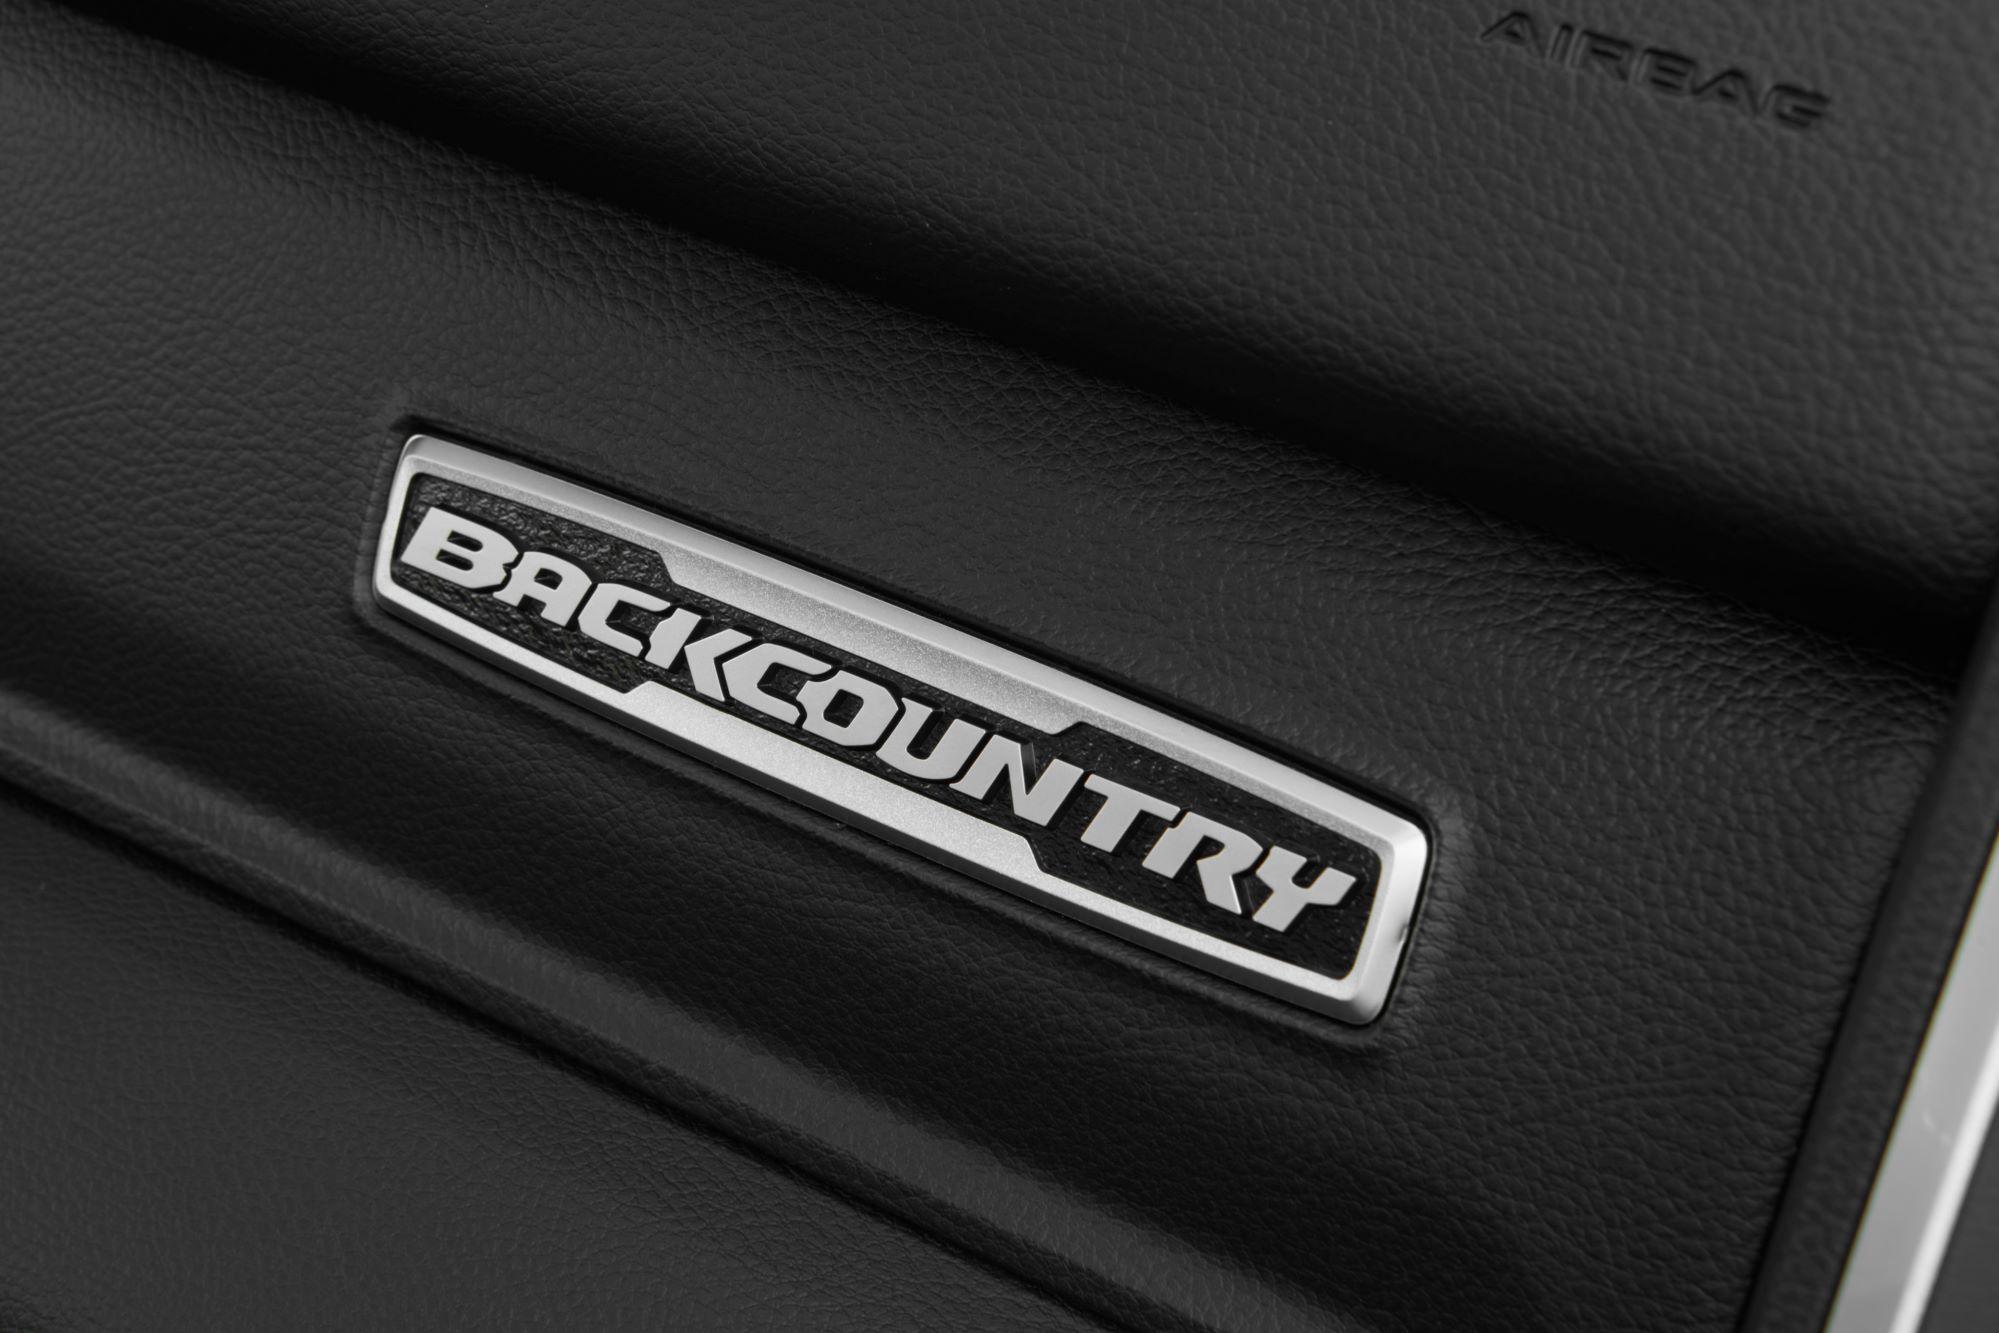 2022 Ram 1500 BackCountry badge